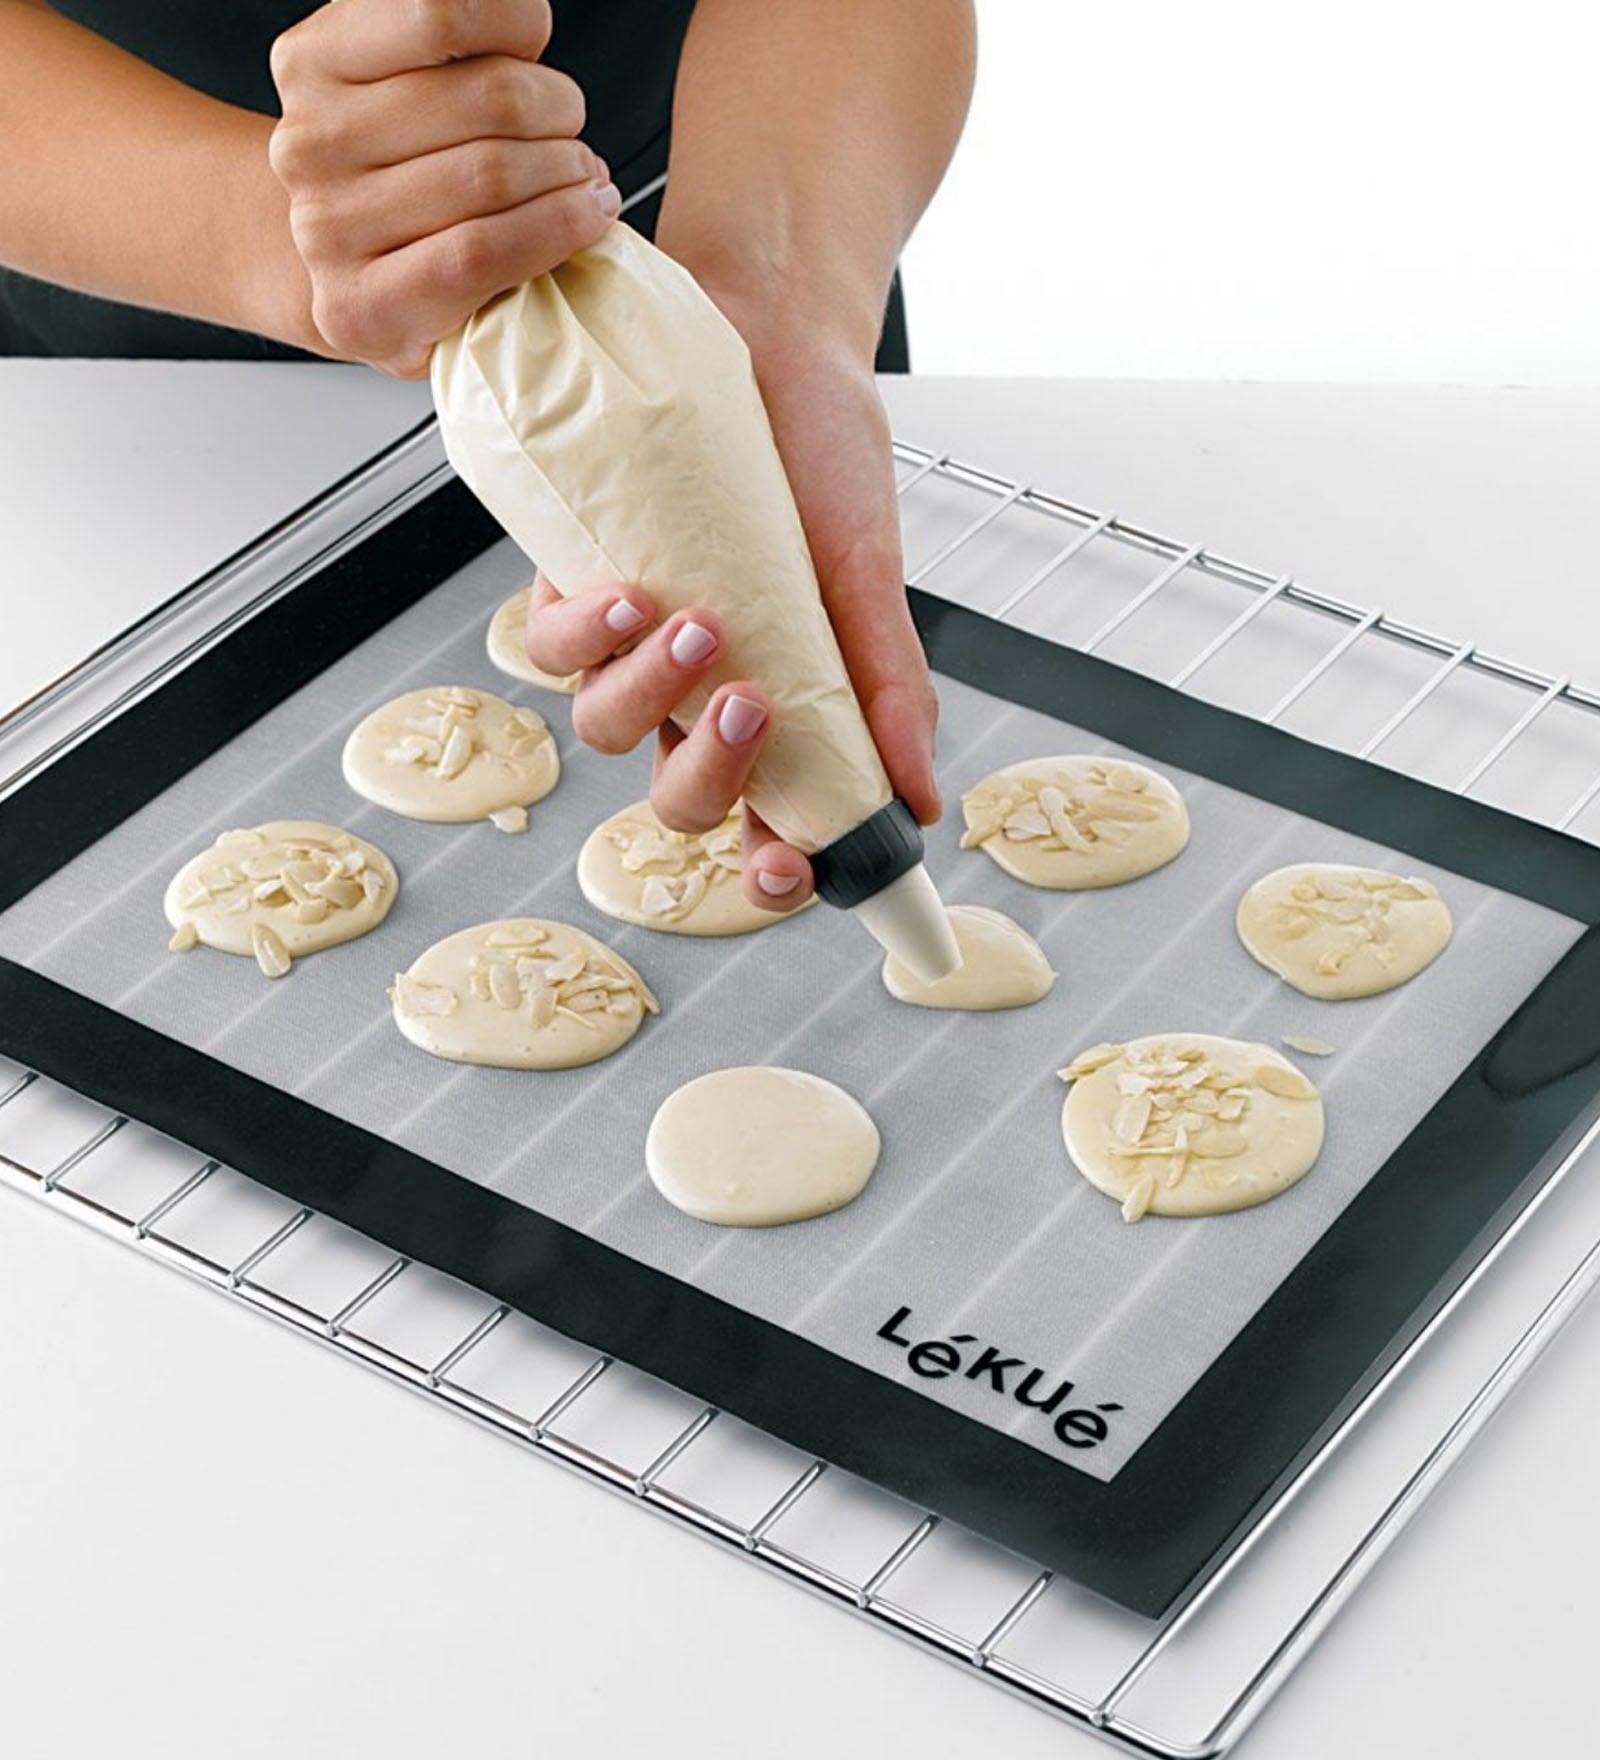 Lekue 12 by 16-Inch Baking Mat, Clear Platinum Silicone Baking Mat